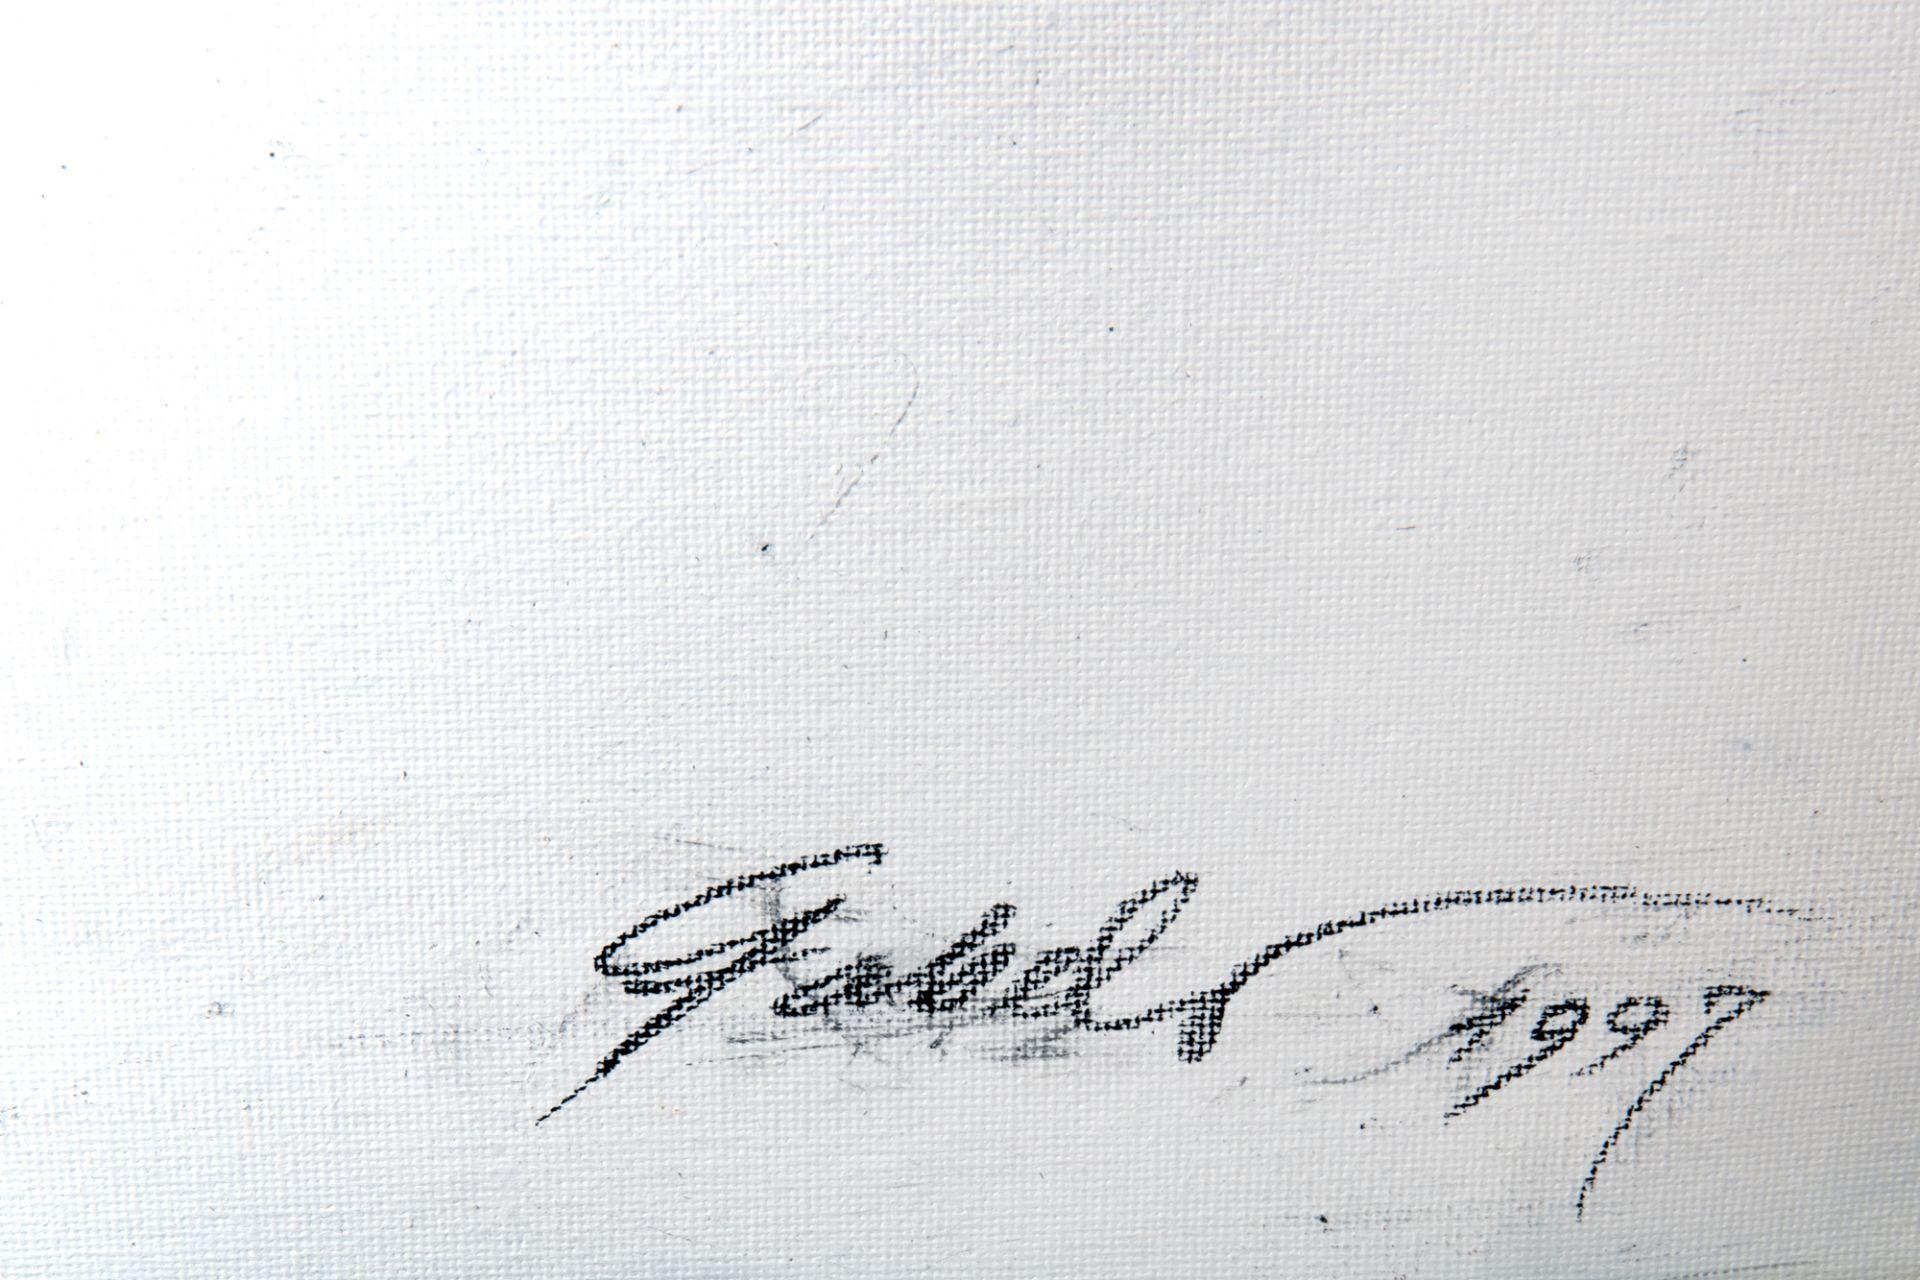 Signature Roberto Fabelo